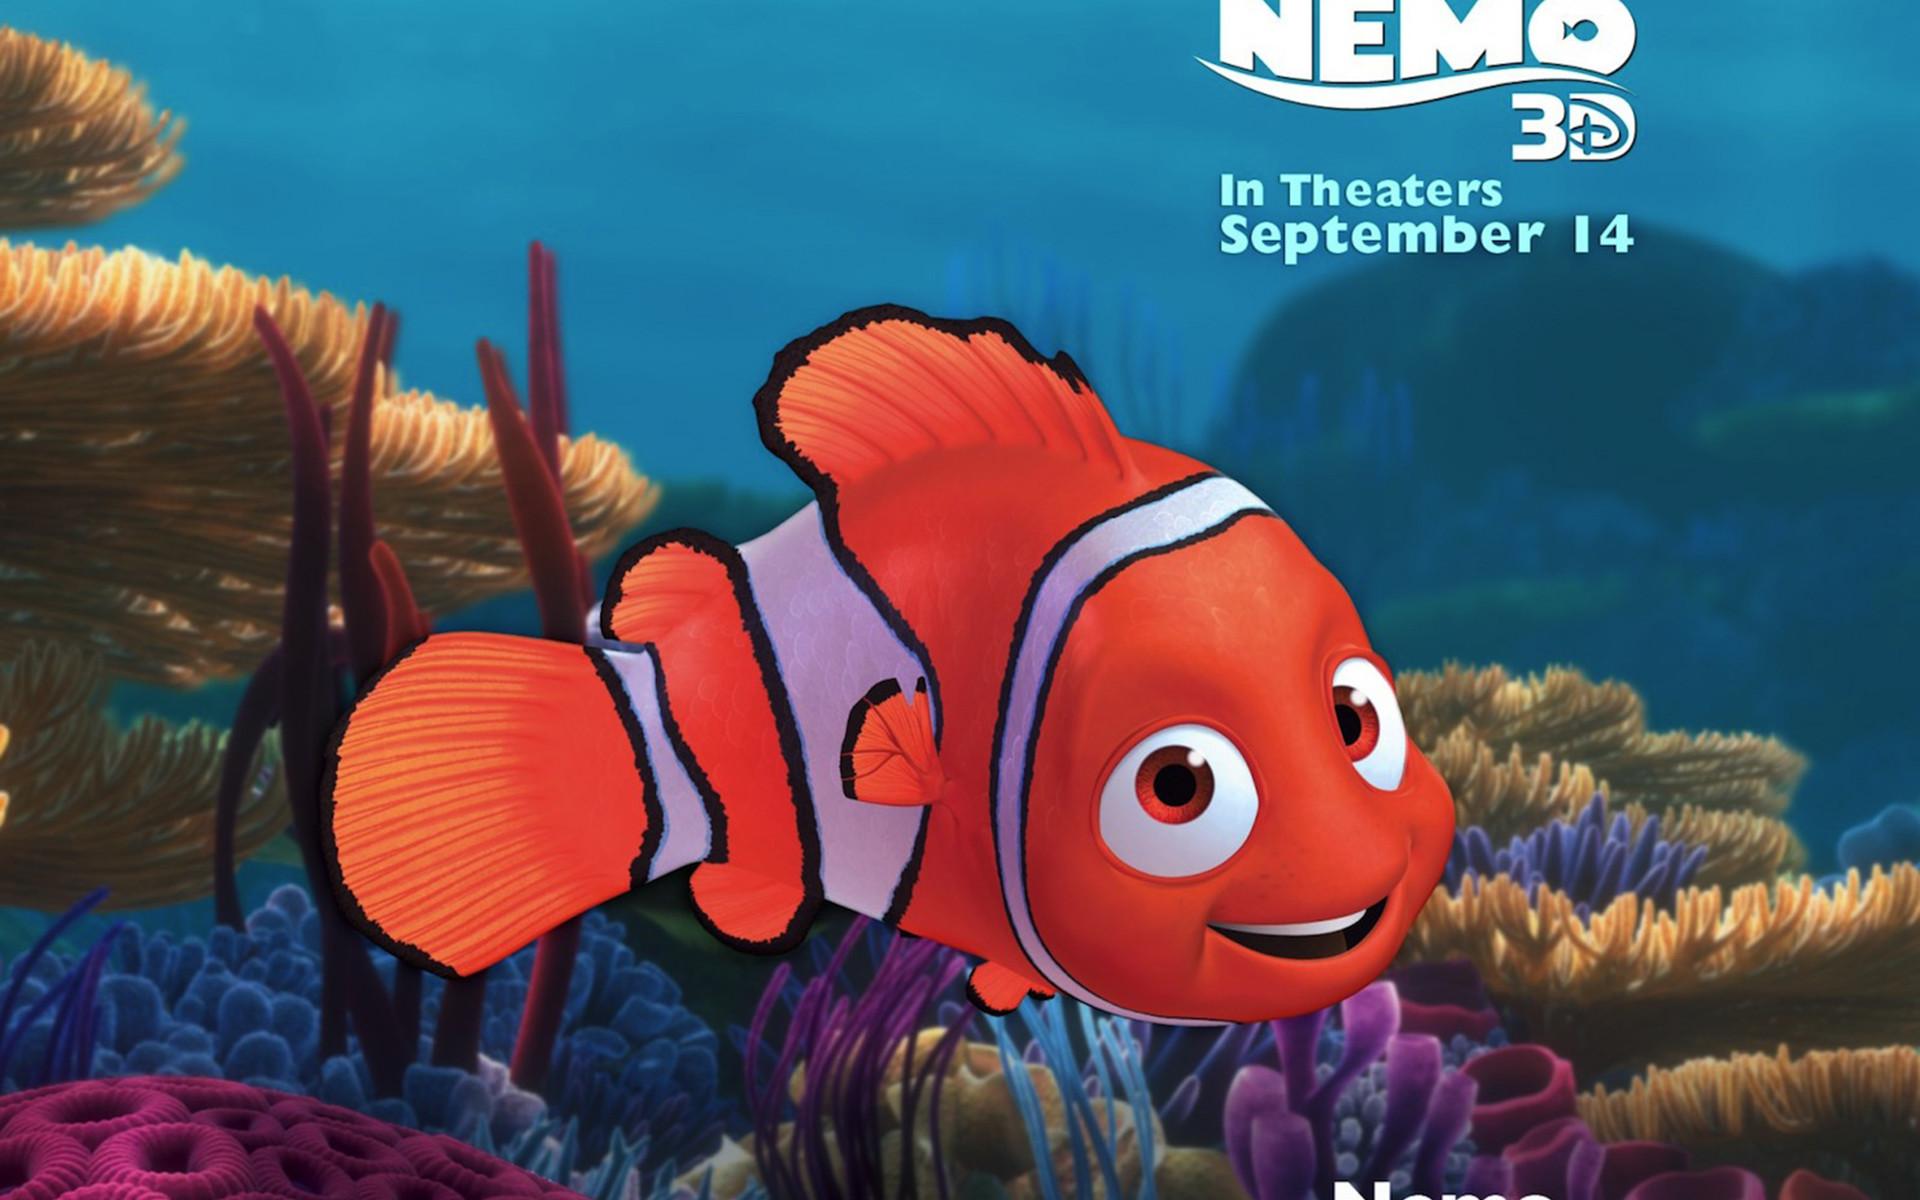 Finding Nemo D Animasi Hd Wallpaper: HD Nemo Wallpapers (61+ Images